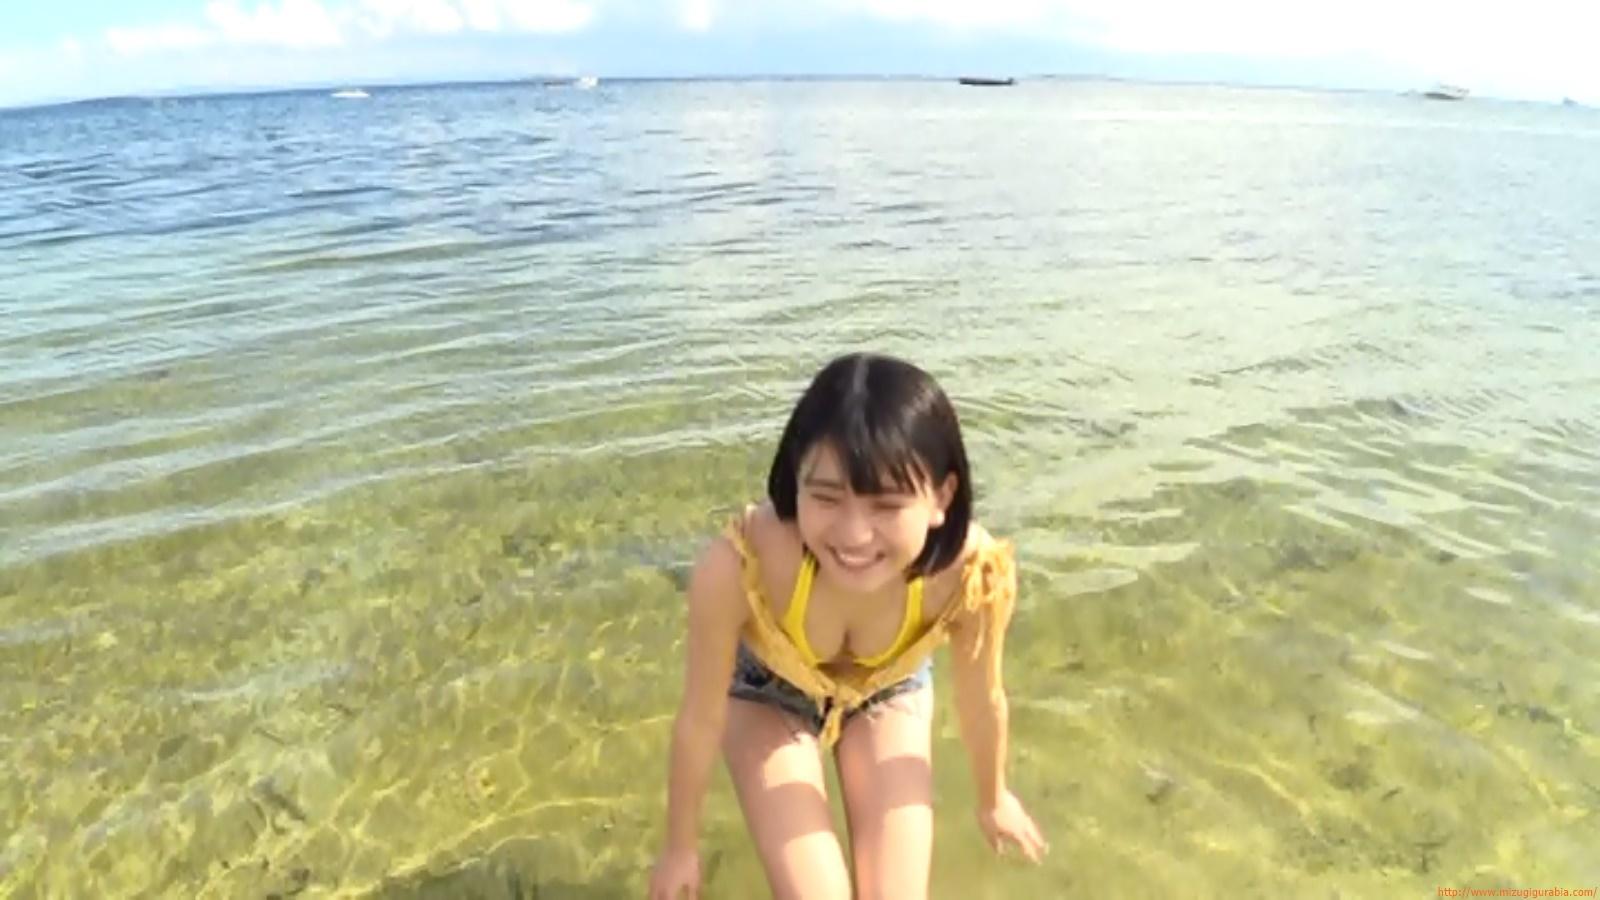 Beach dating088